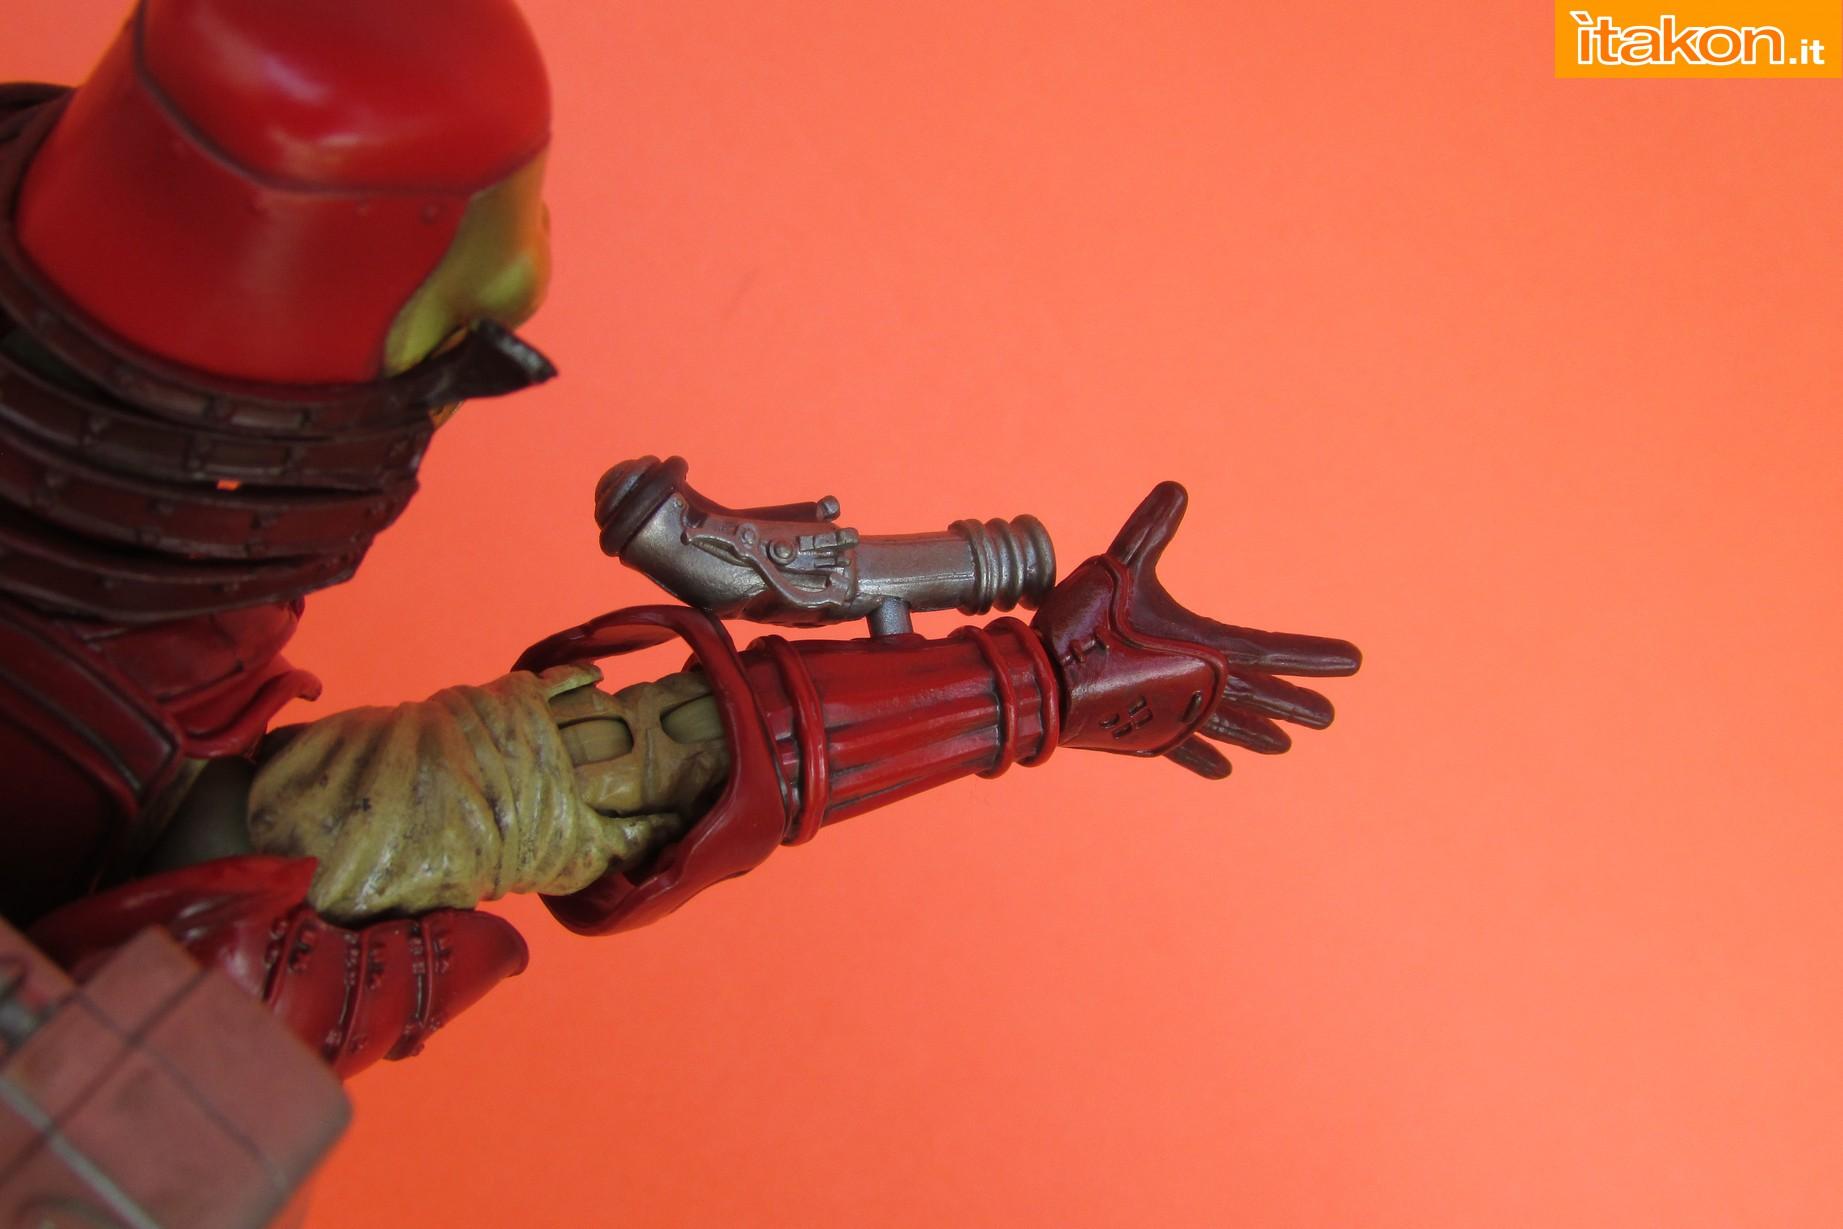 Link a Marvel Comics Koutetsu Samurai Iron Man Mark 3 Meishou MANGA REALIZATION review Bandai Itakon.it41